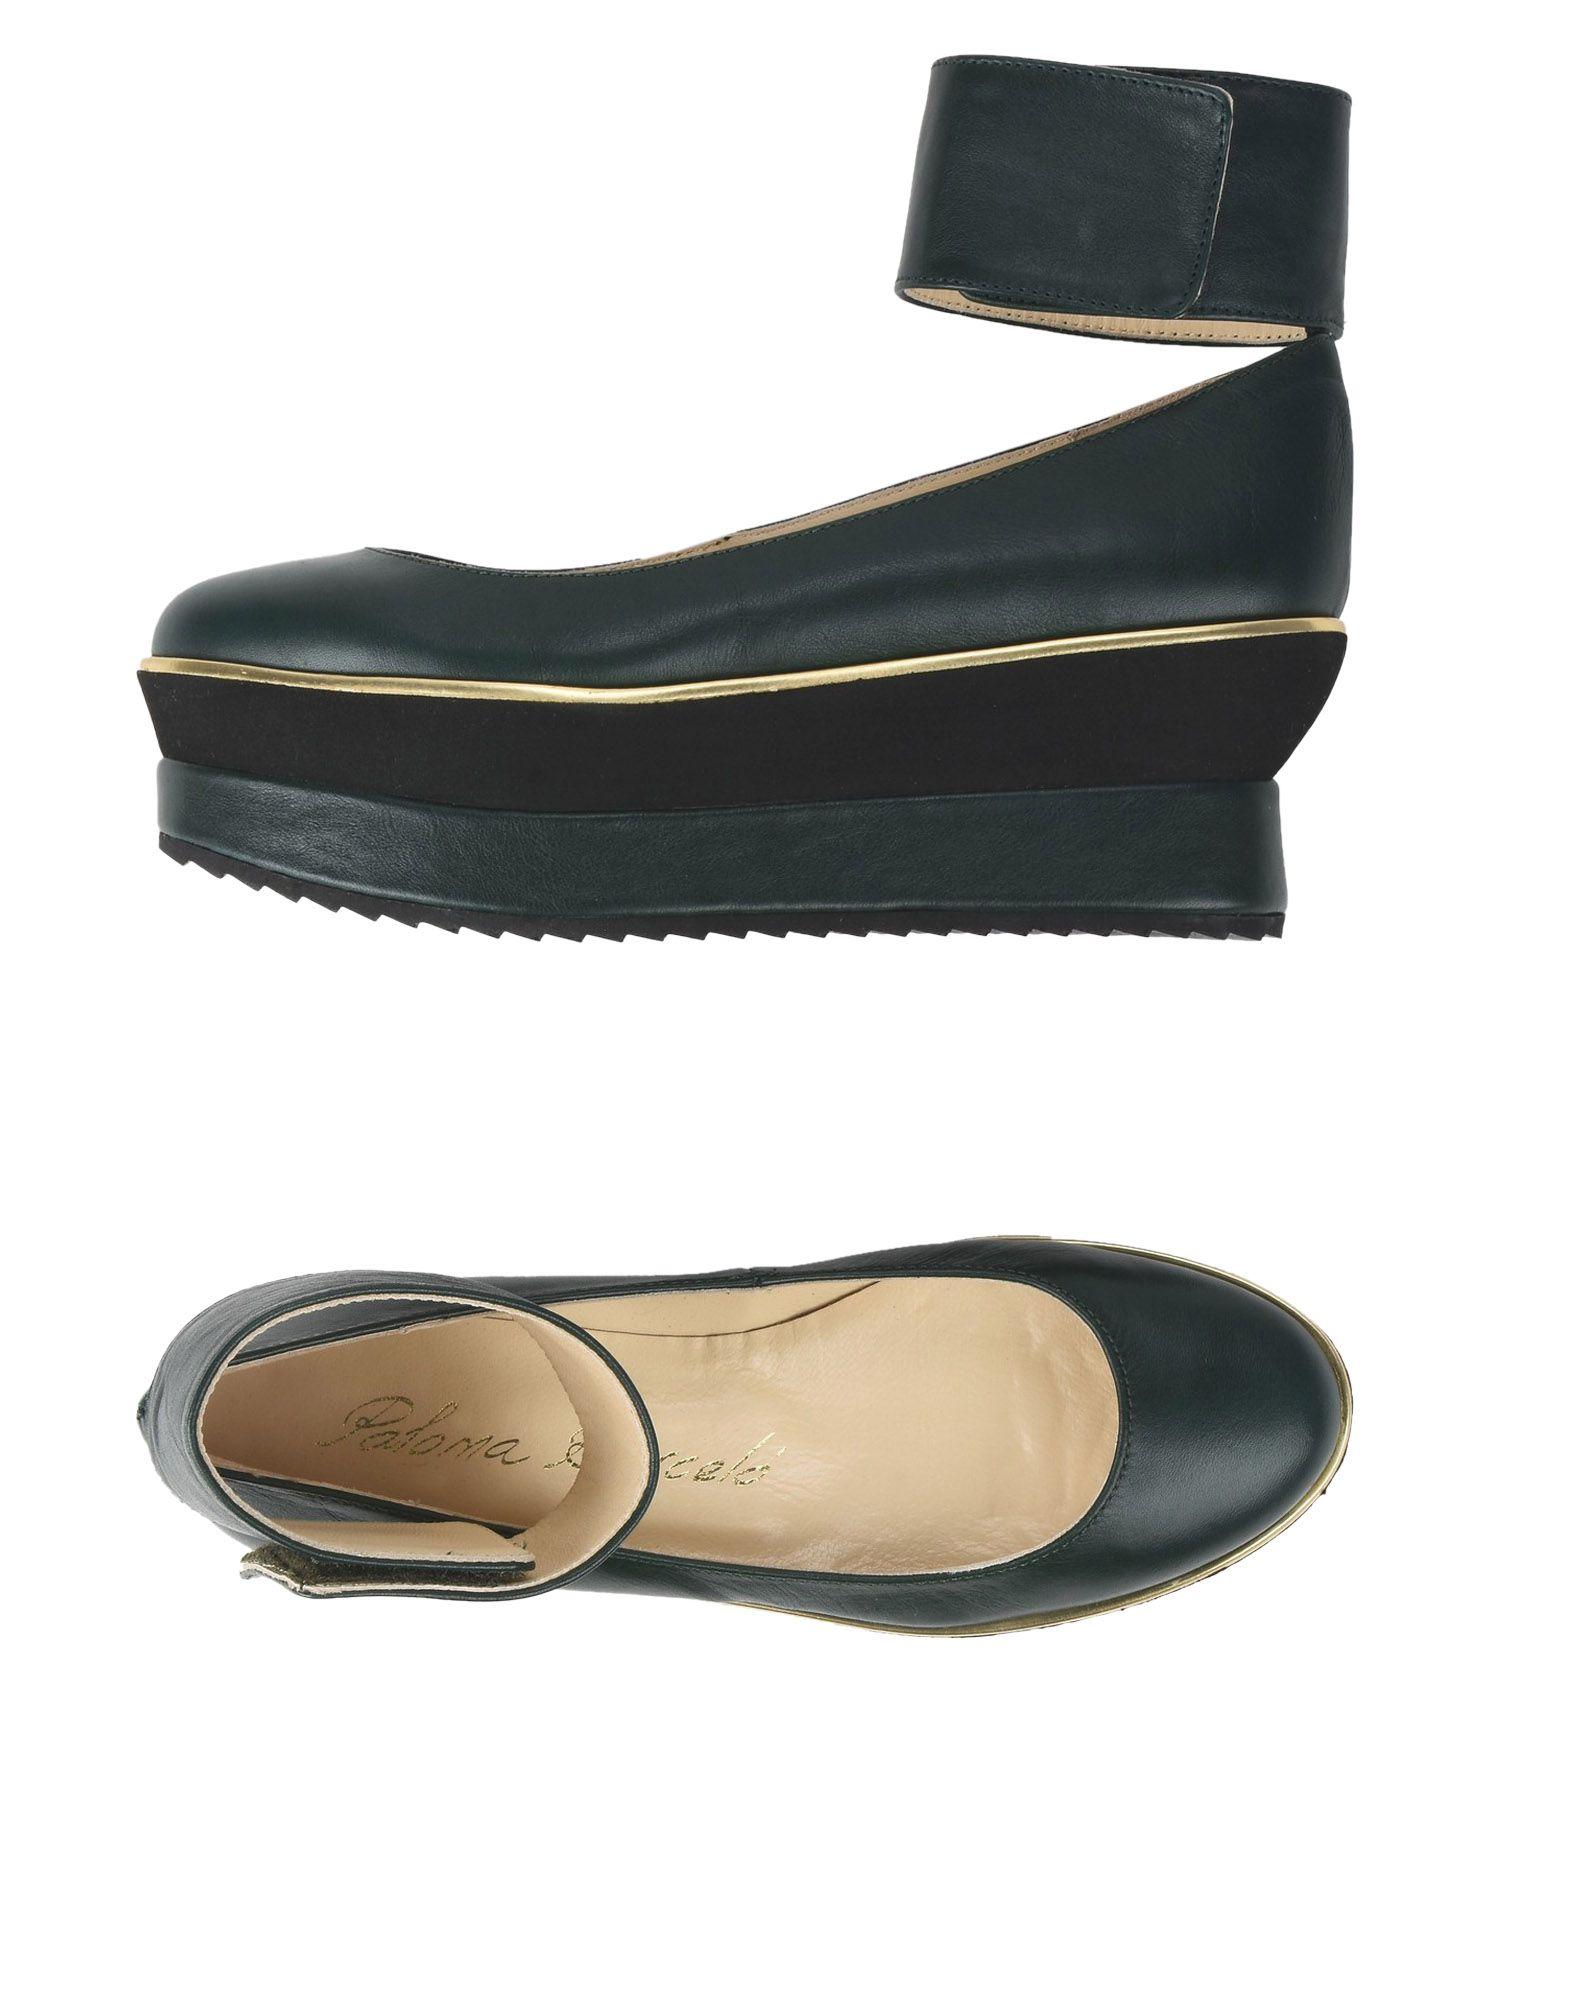 Stilvolle Barceló billige Schuhe Paloma Barceló Stilvolle Pumps Damen  11501234JR f11675